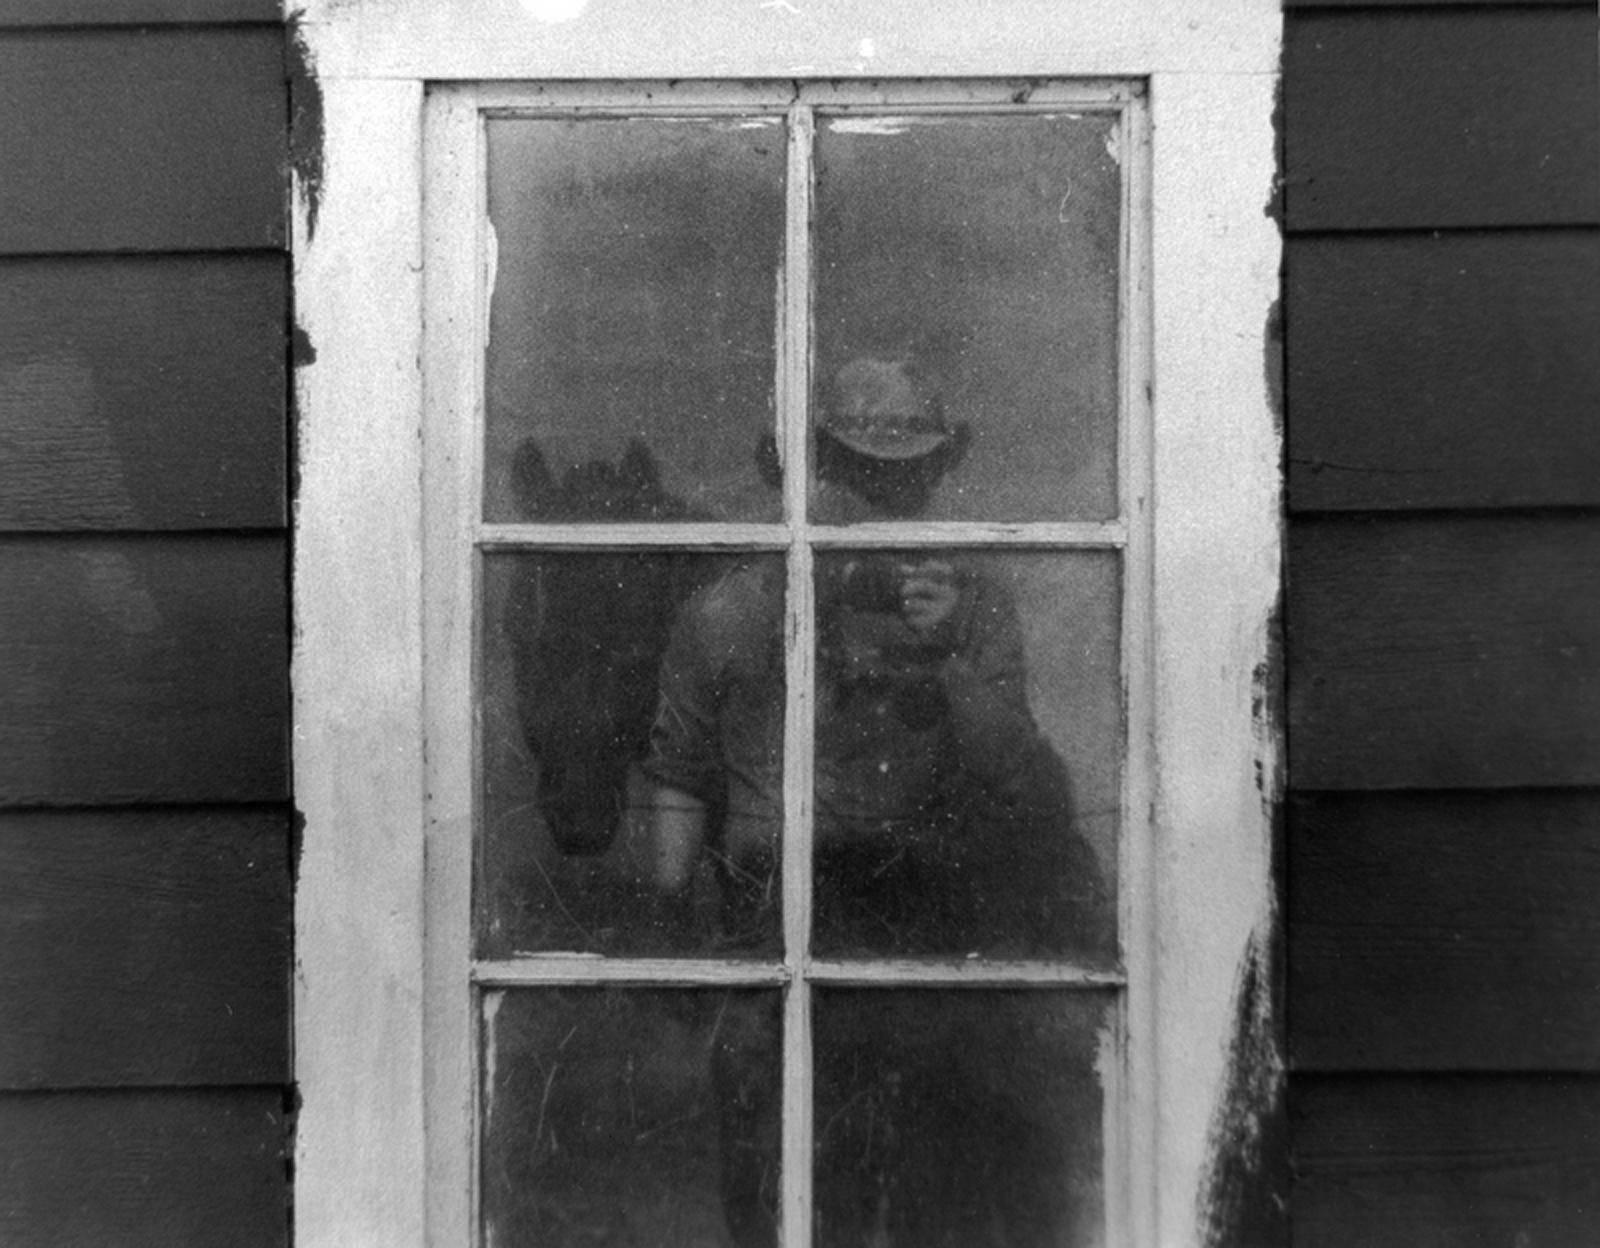 Photographer in the window, Bspo06, B&w, Cowboy, Farm, HQ Photo